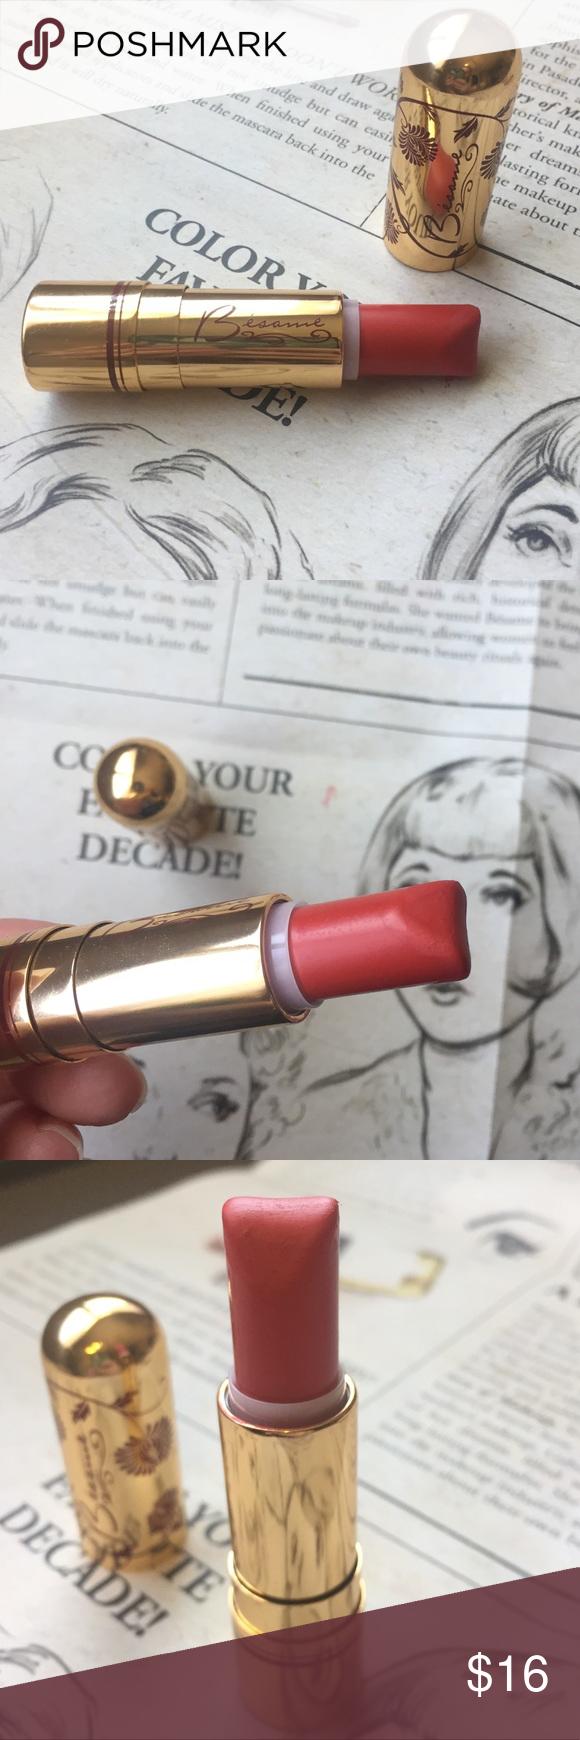 Tango Red Bésame cosmetics lipstick retro vintage Besame